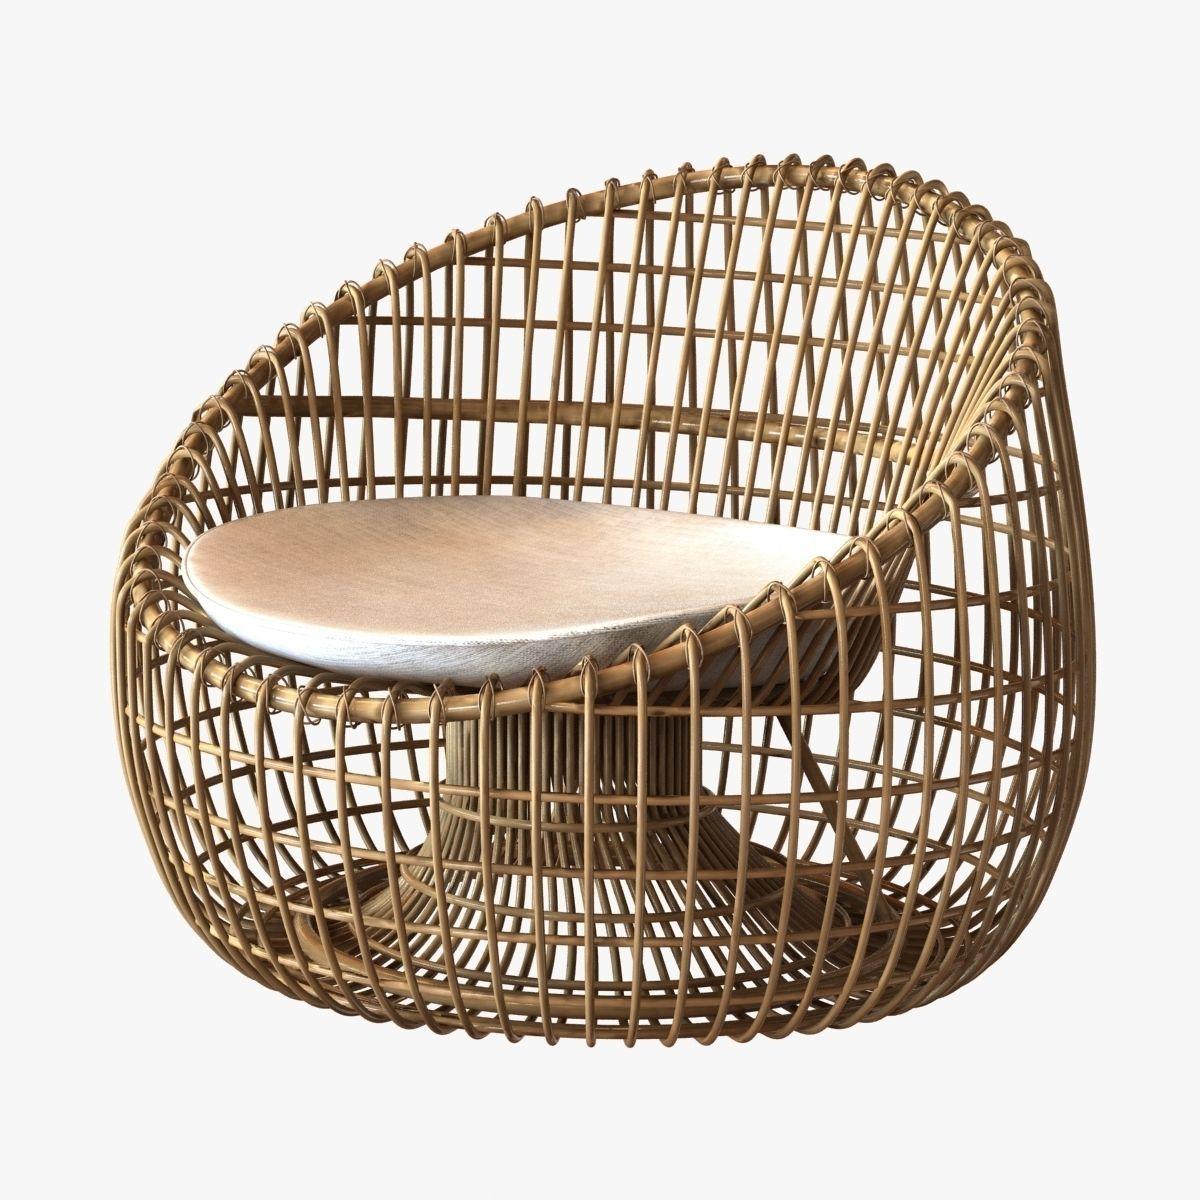 Cane line nest lounge chair 3d model max obj 3ds fbx for Decoration 3d model free download